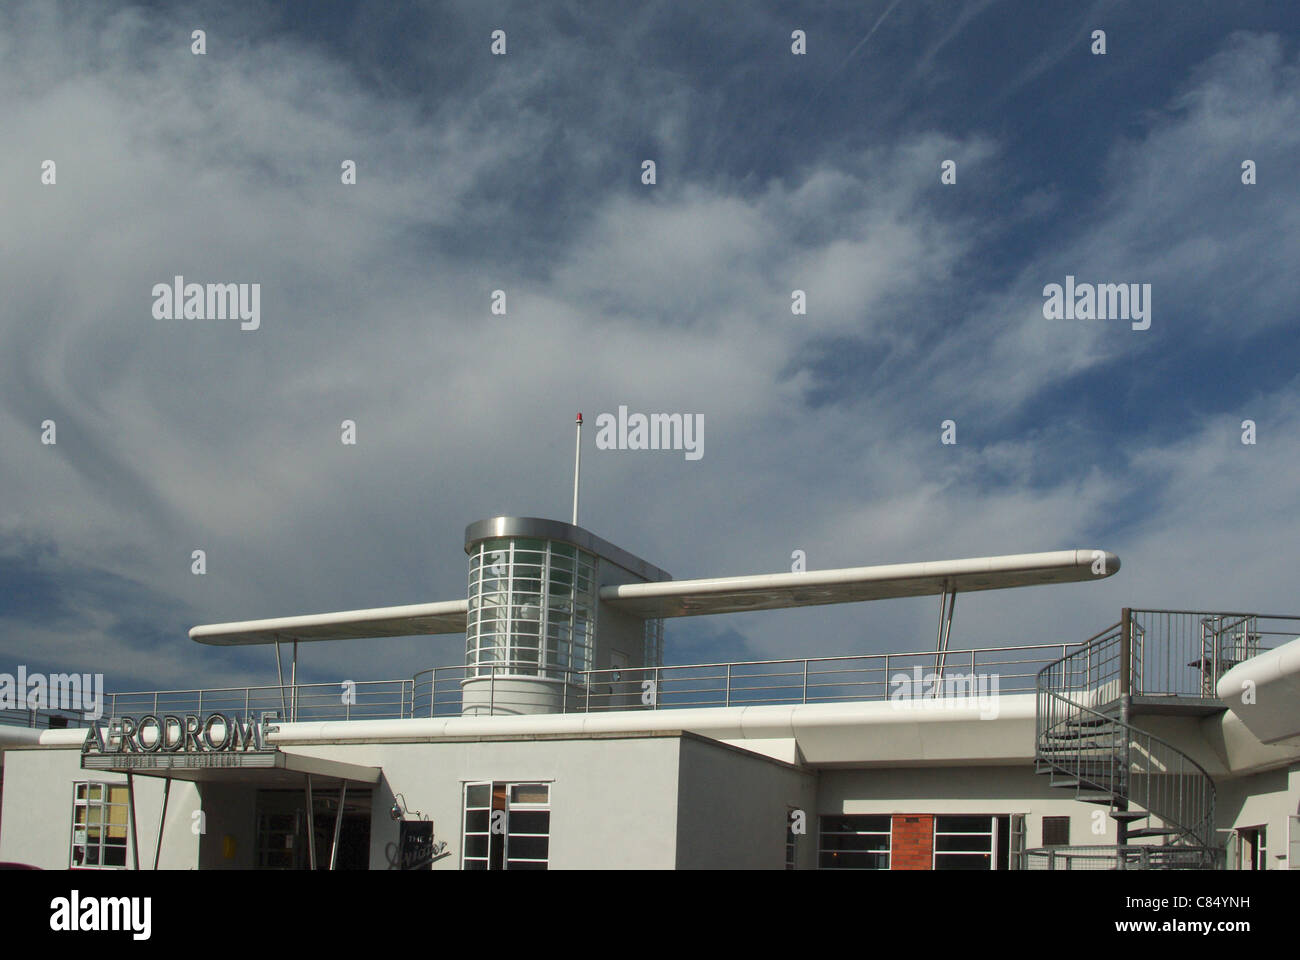 Art deco roofline at the Aviator Hotel, Sywell Aerodrome, UK - Stock Image